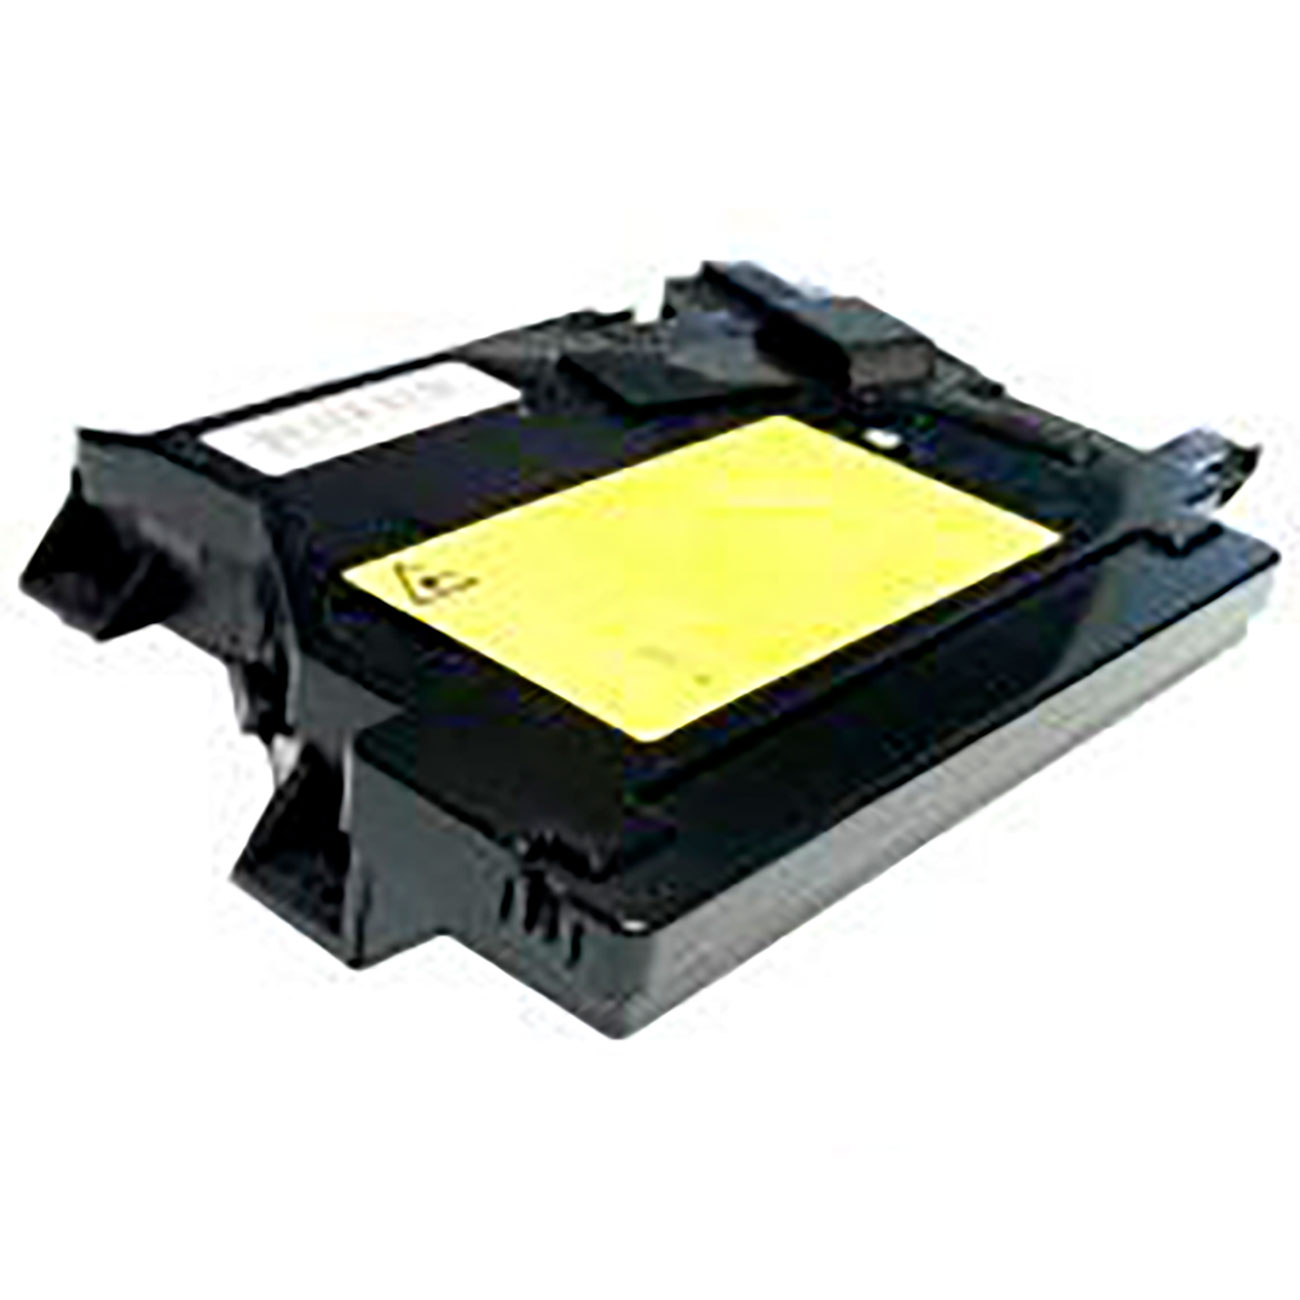 Фото Блок лазера Kyocera LK-160 для Kyocera FS-1120DN, FS-1120D, P2035d, FS-1030MFP, FS-1130MFP, M2030dn, M2530dn {302LY93030}